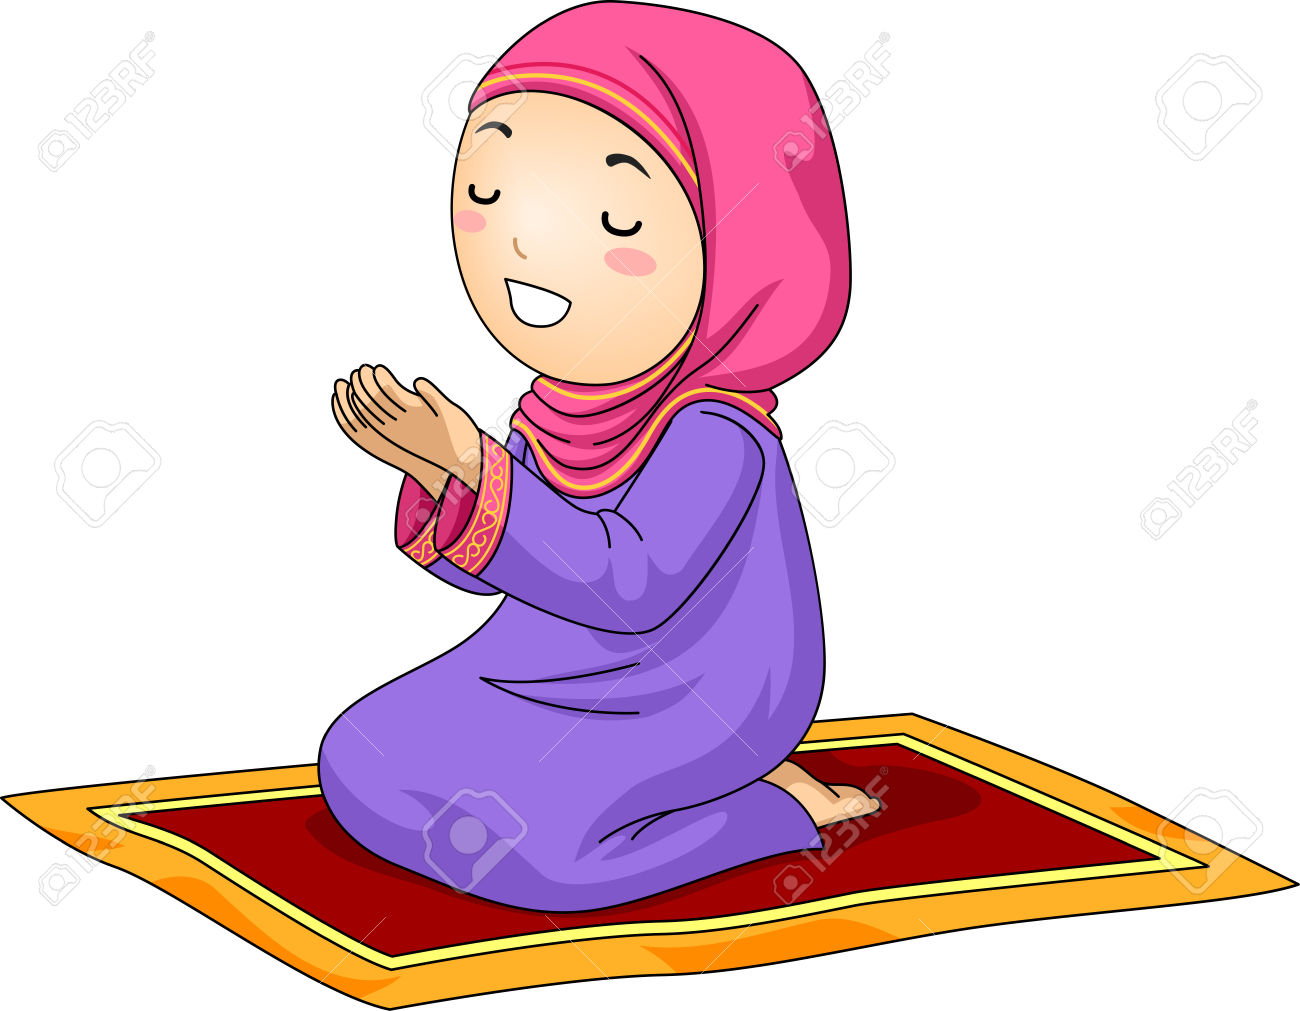 1300x1011 Muslim Girl Clipart Hd Pencil Art 221,286 Clip Art People Stock